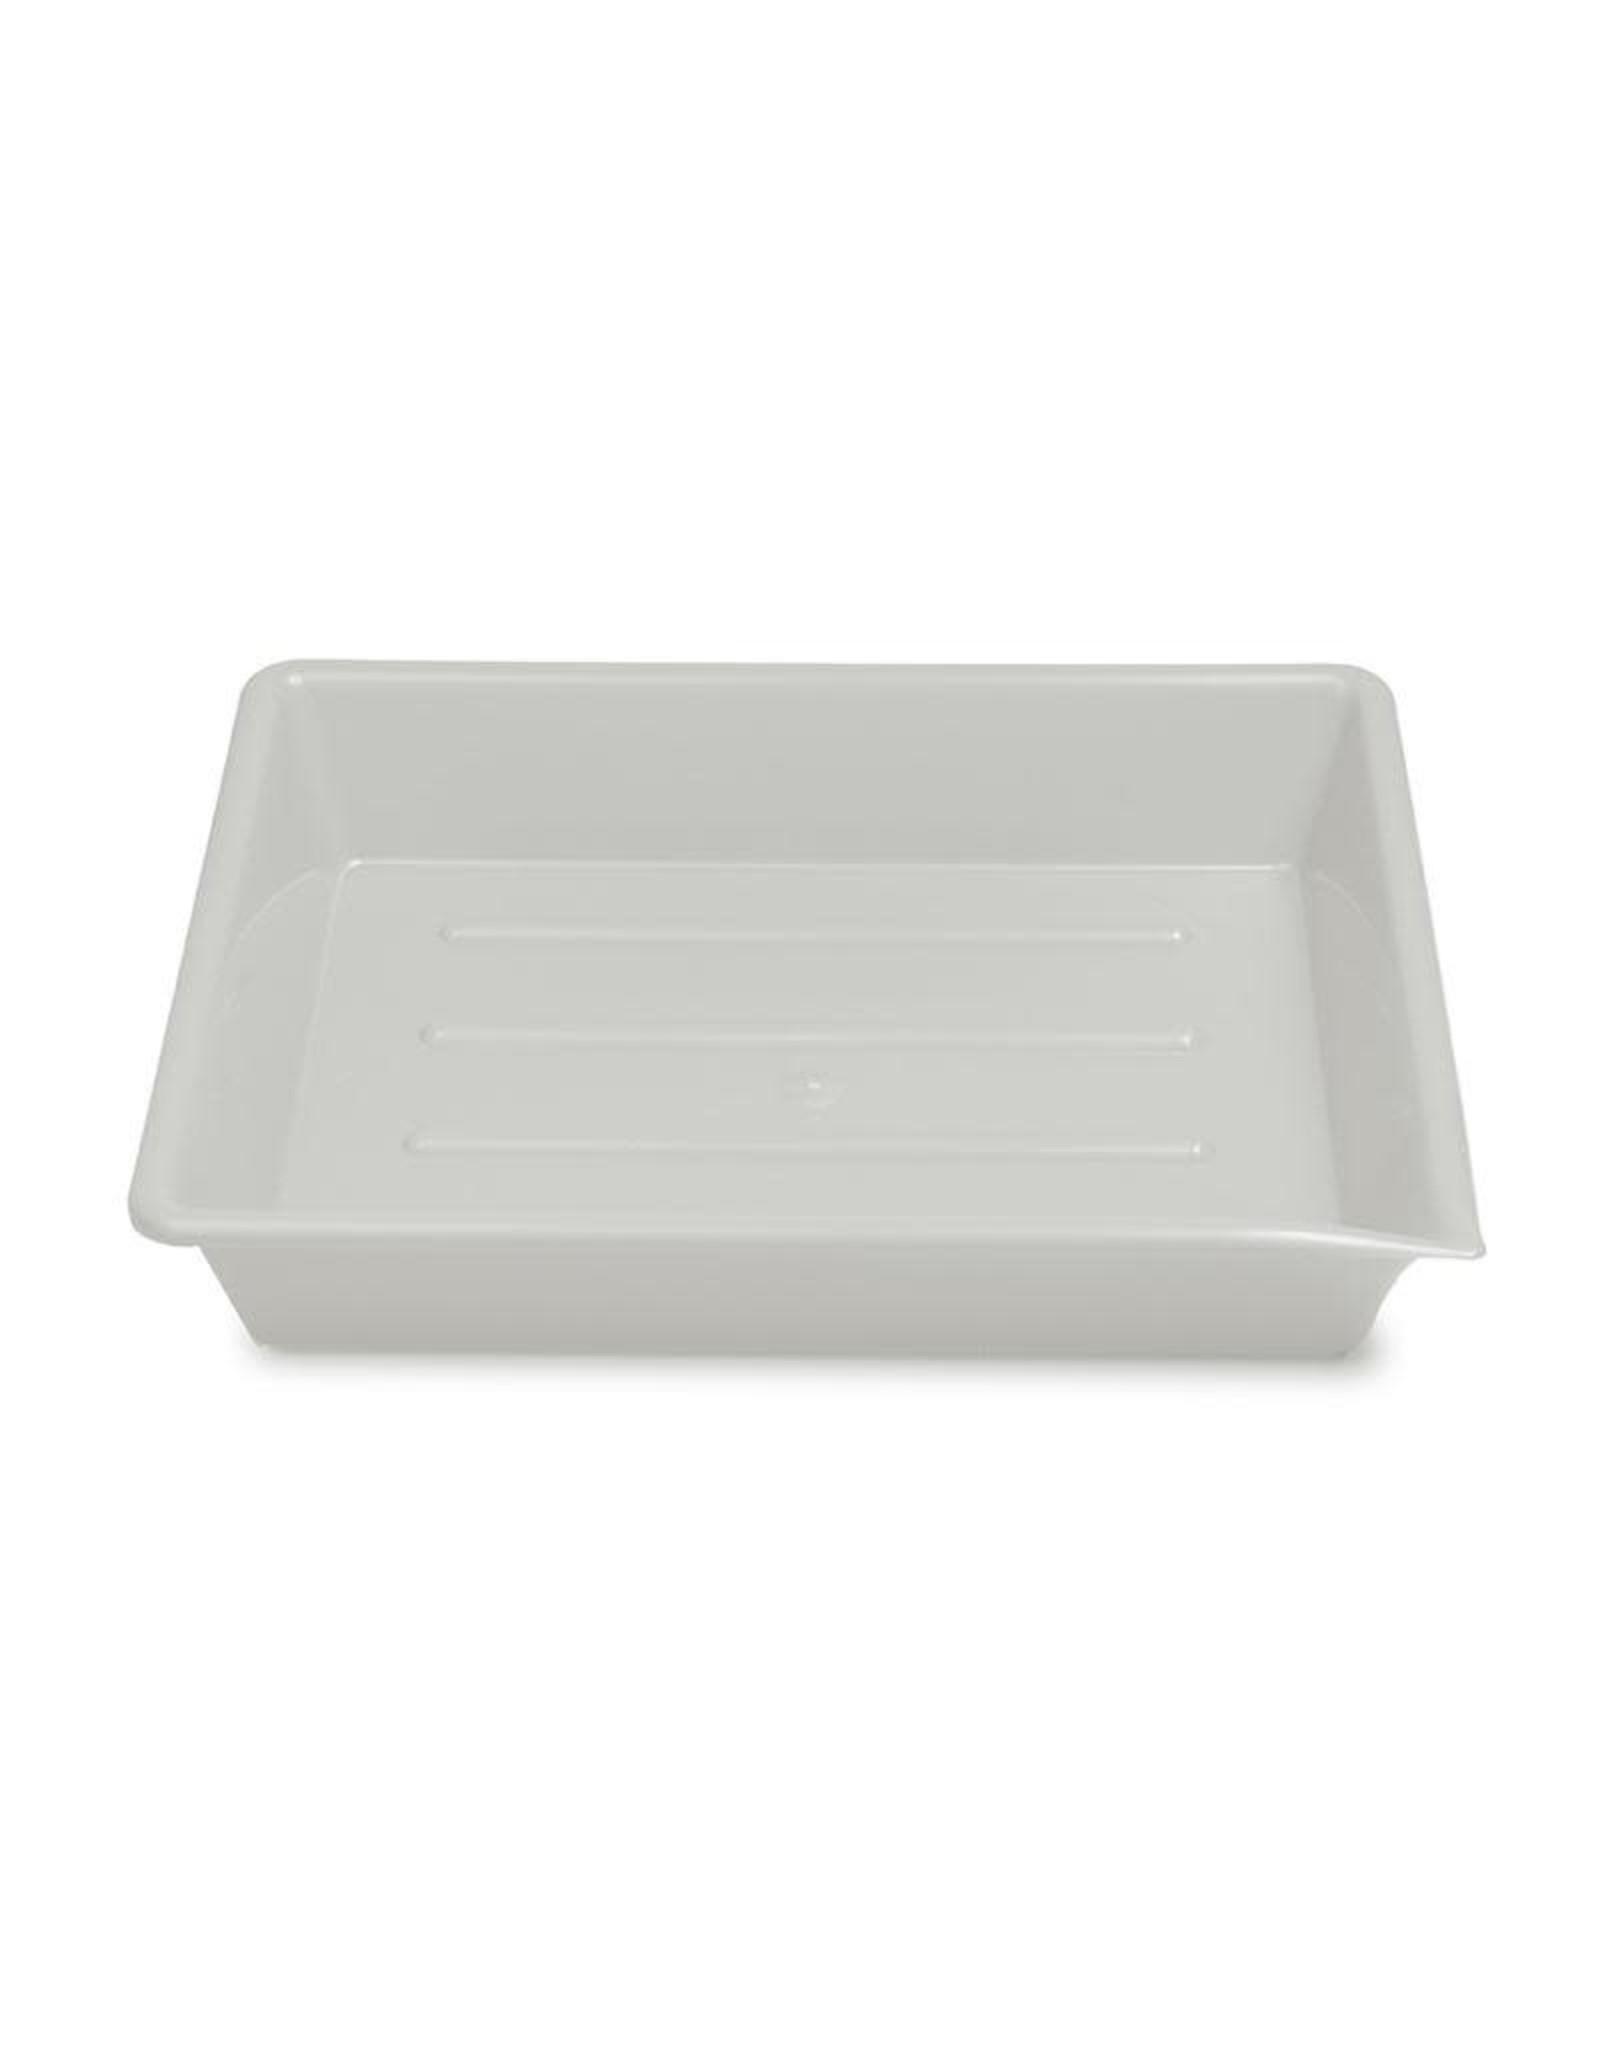 "Kaiser Kaiser Lab Tray, 20 x 25 cm (7.9 x 9.8""), white"